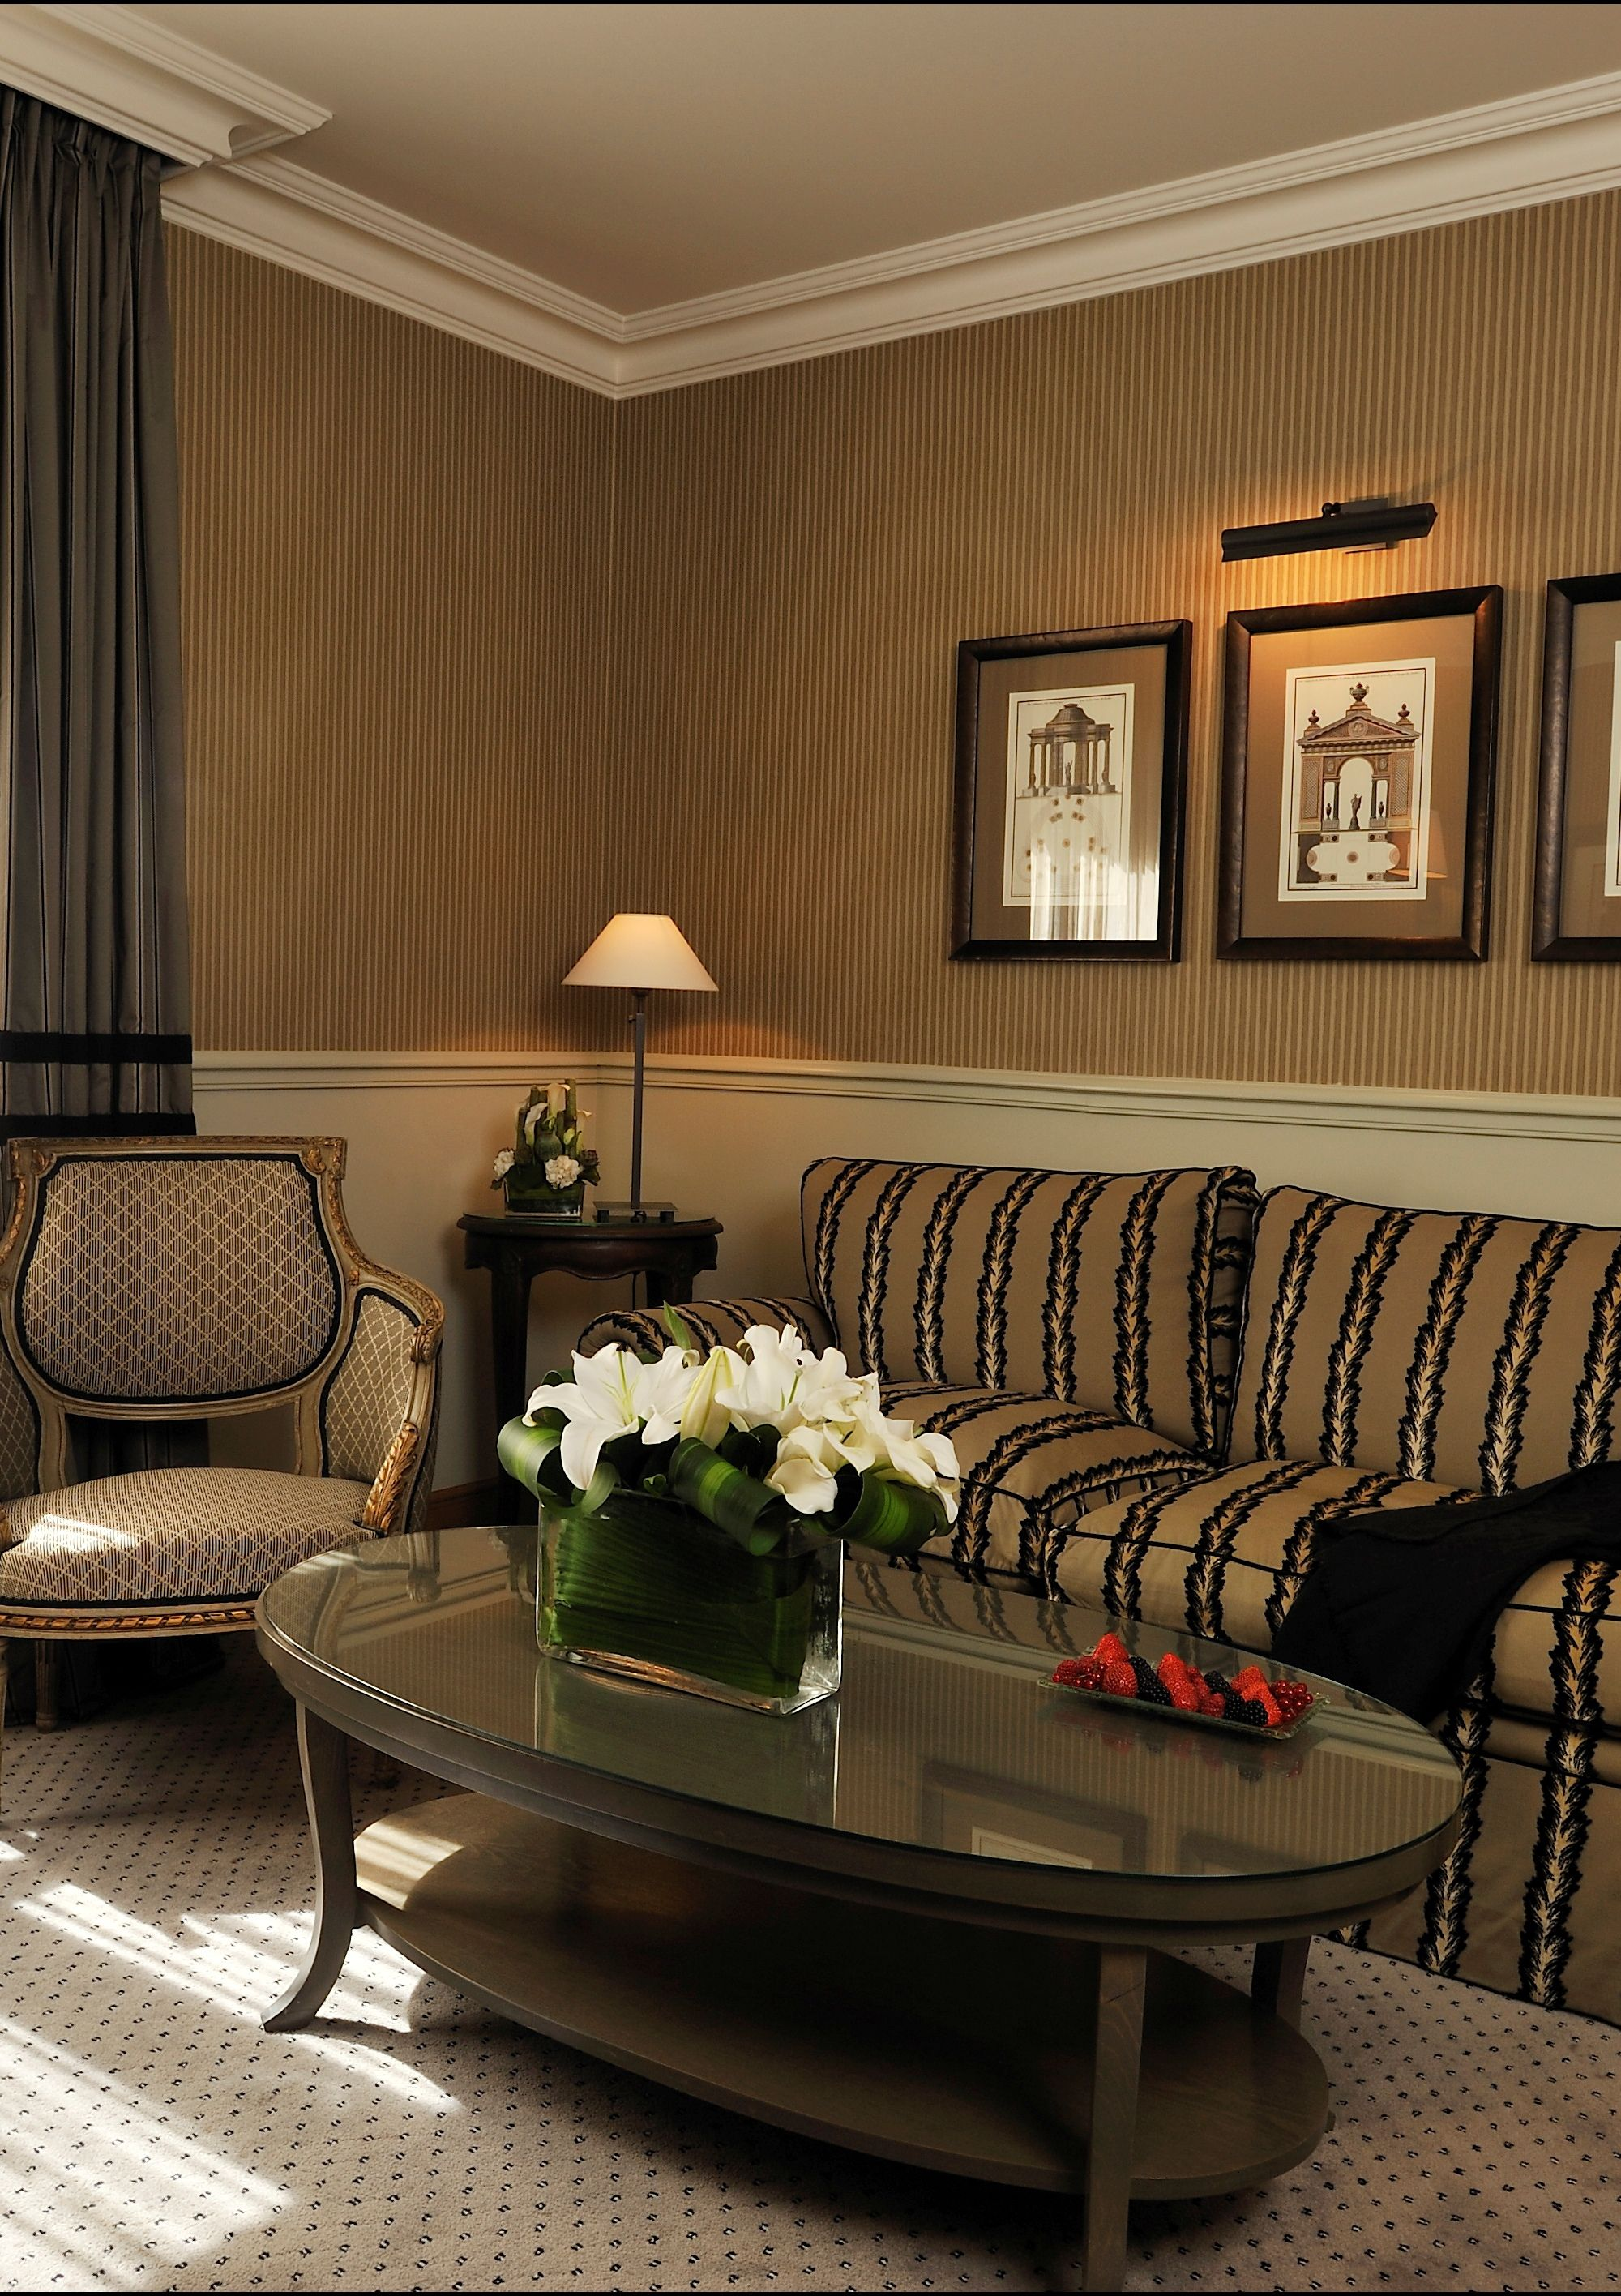 Uniquely Decorated Suites At Hotel De Vigny Paris, 5-star